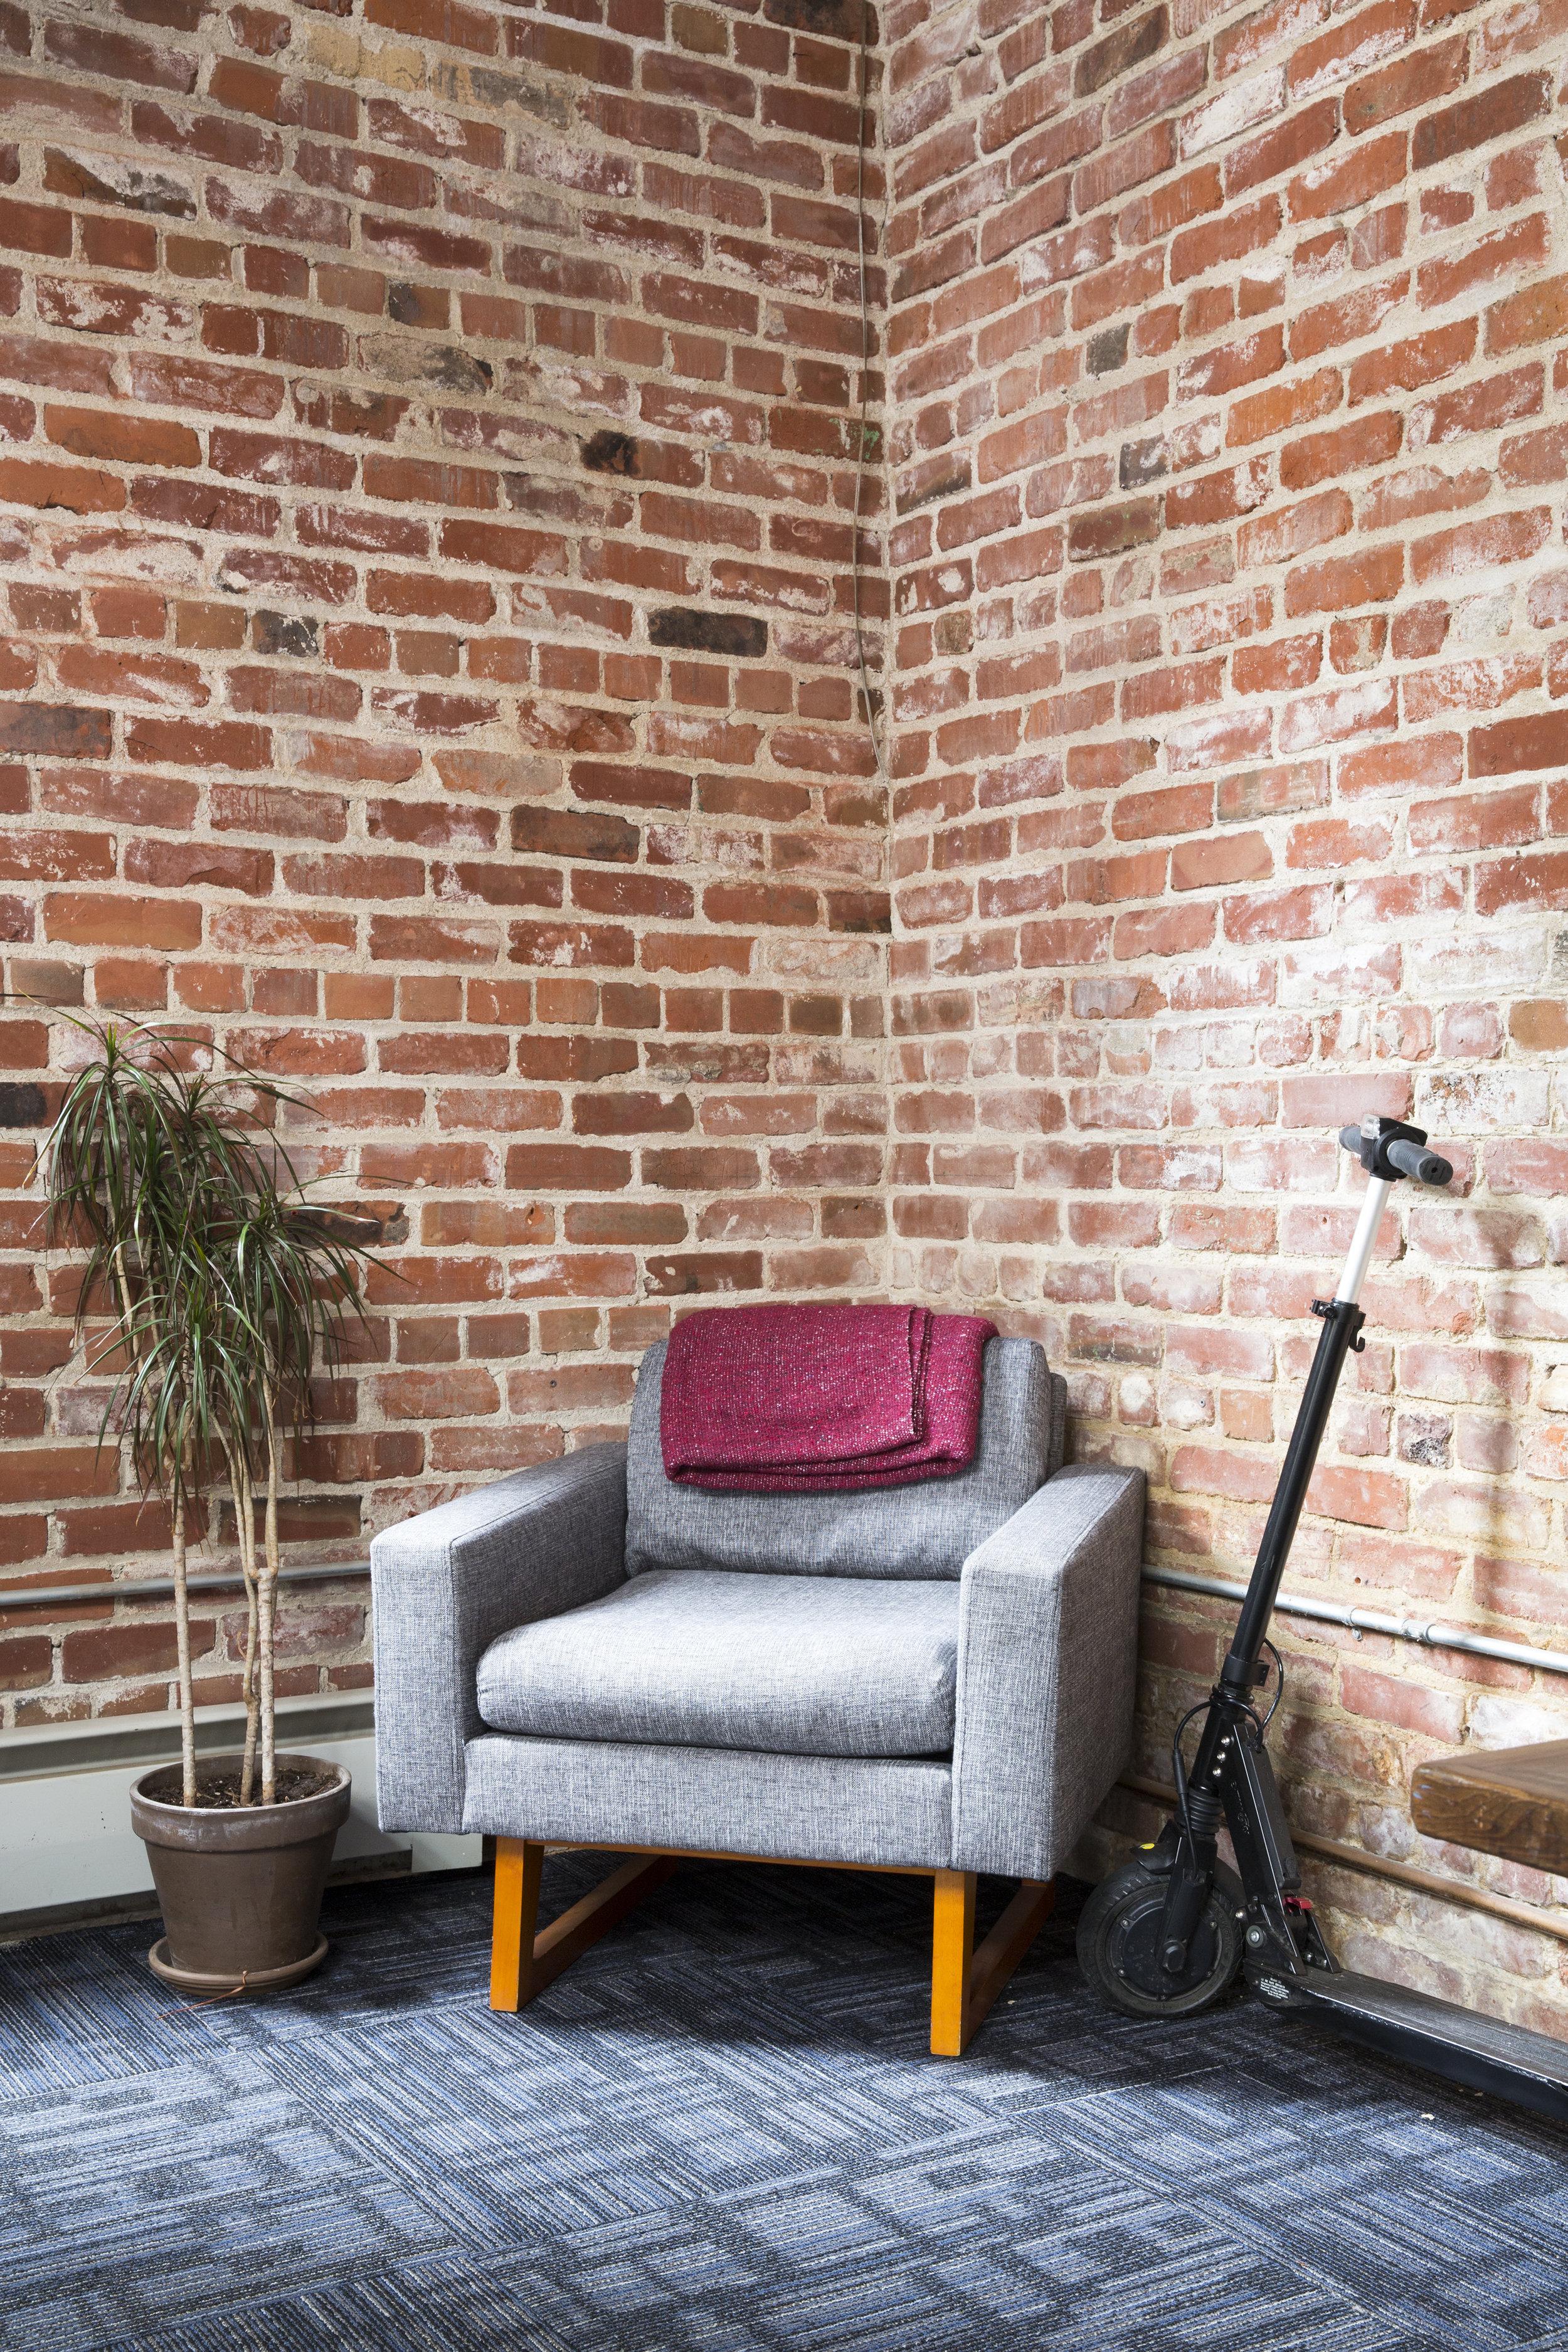 tgg coner chair.JPG